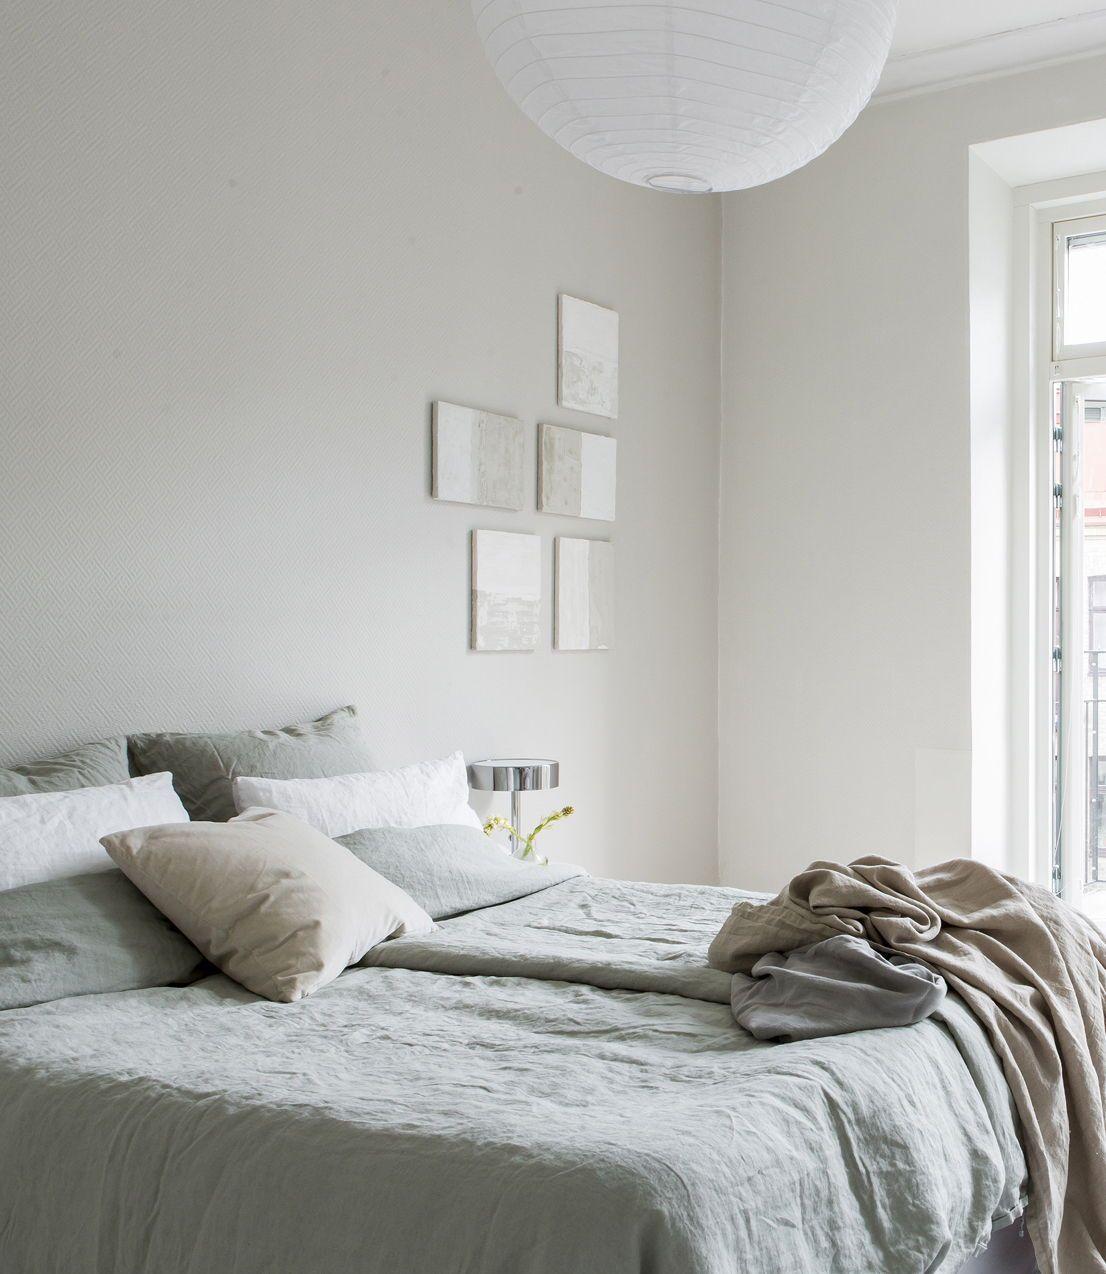 Very Colorful Bedroom: Beige Bedroom In Spring Tints